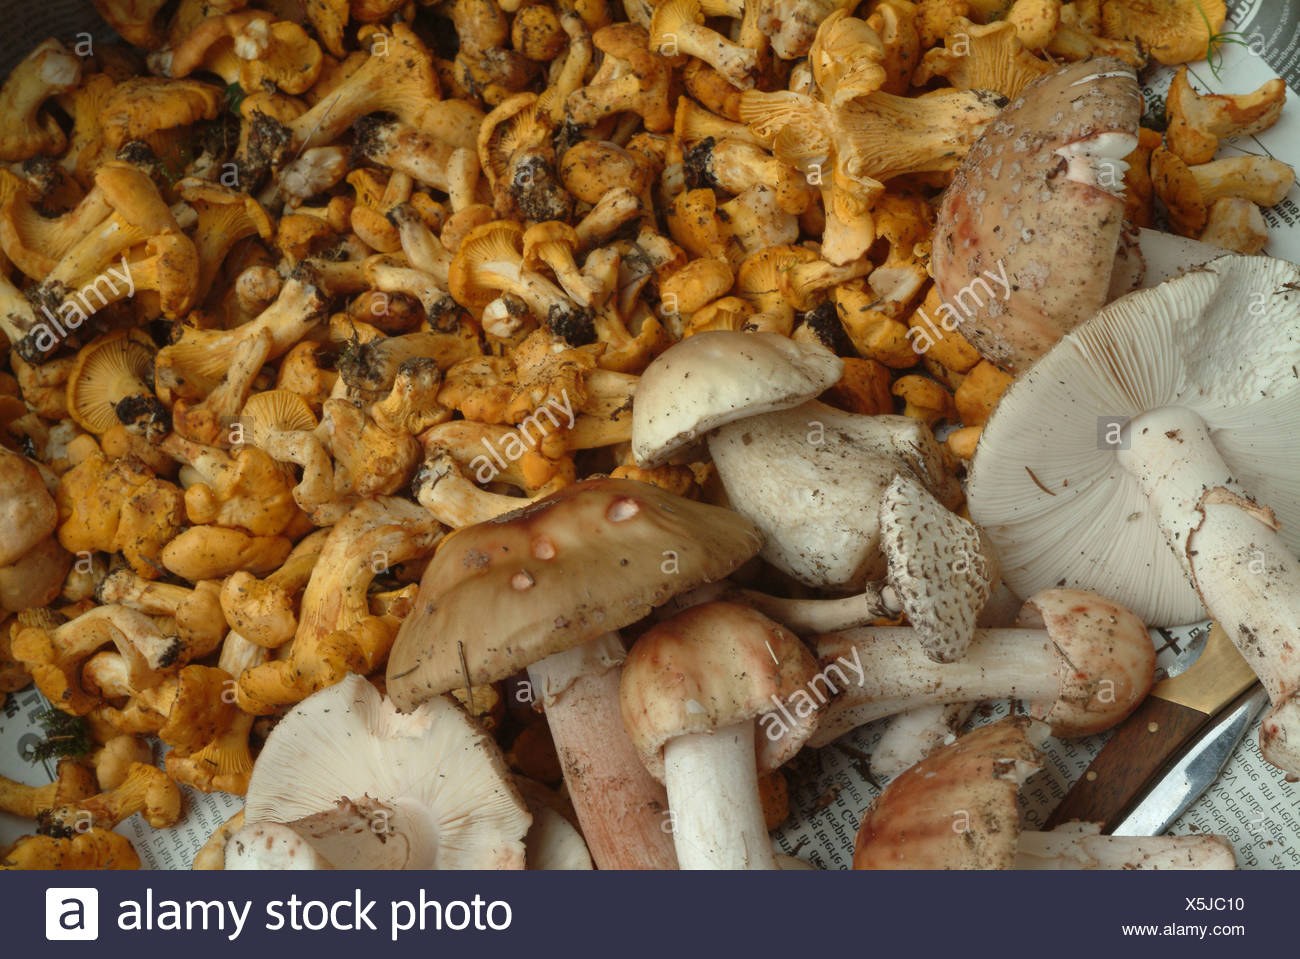 Pilze - Mushrooms - Stock Image